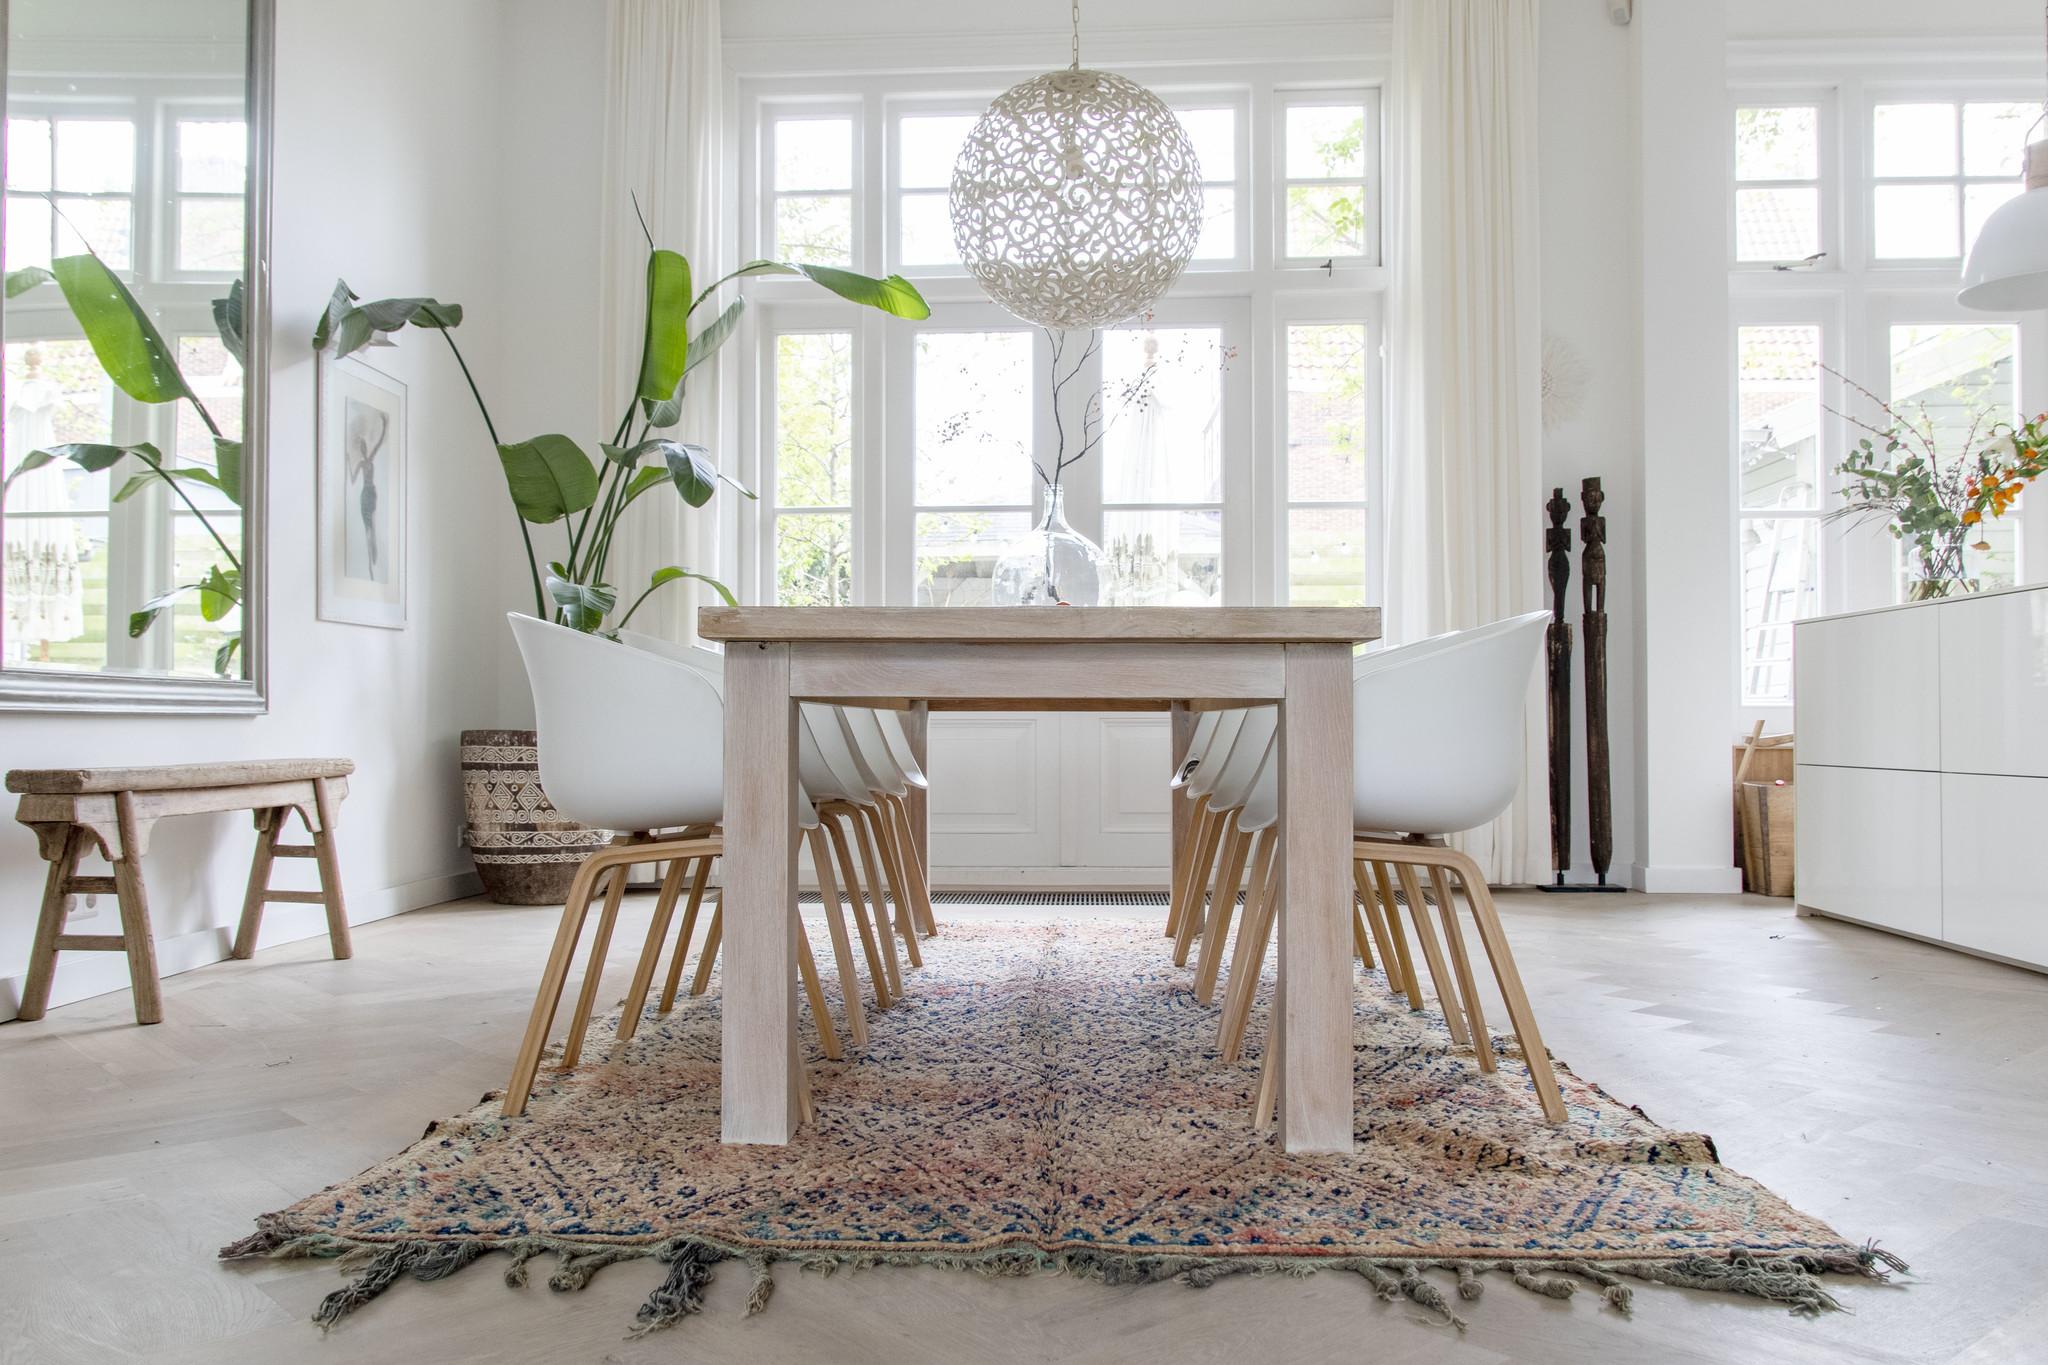 Simply Pure Handgefertigter Vintage Beni M'guild Berber-Teppich aus Marokko  190 x 337 cm